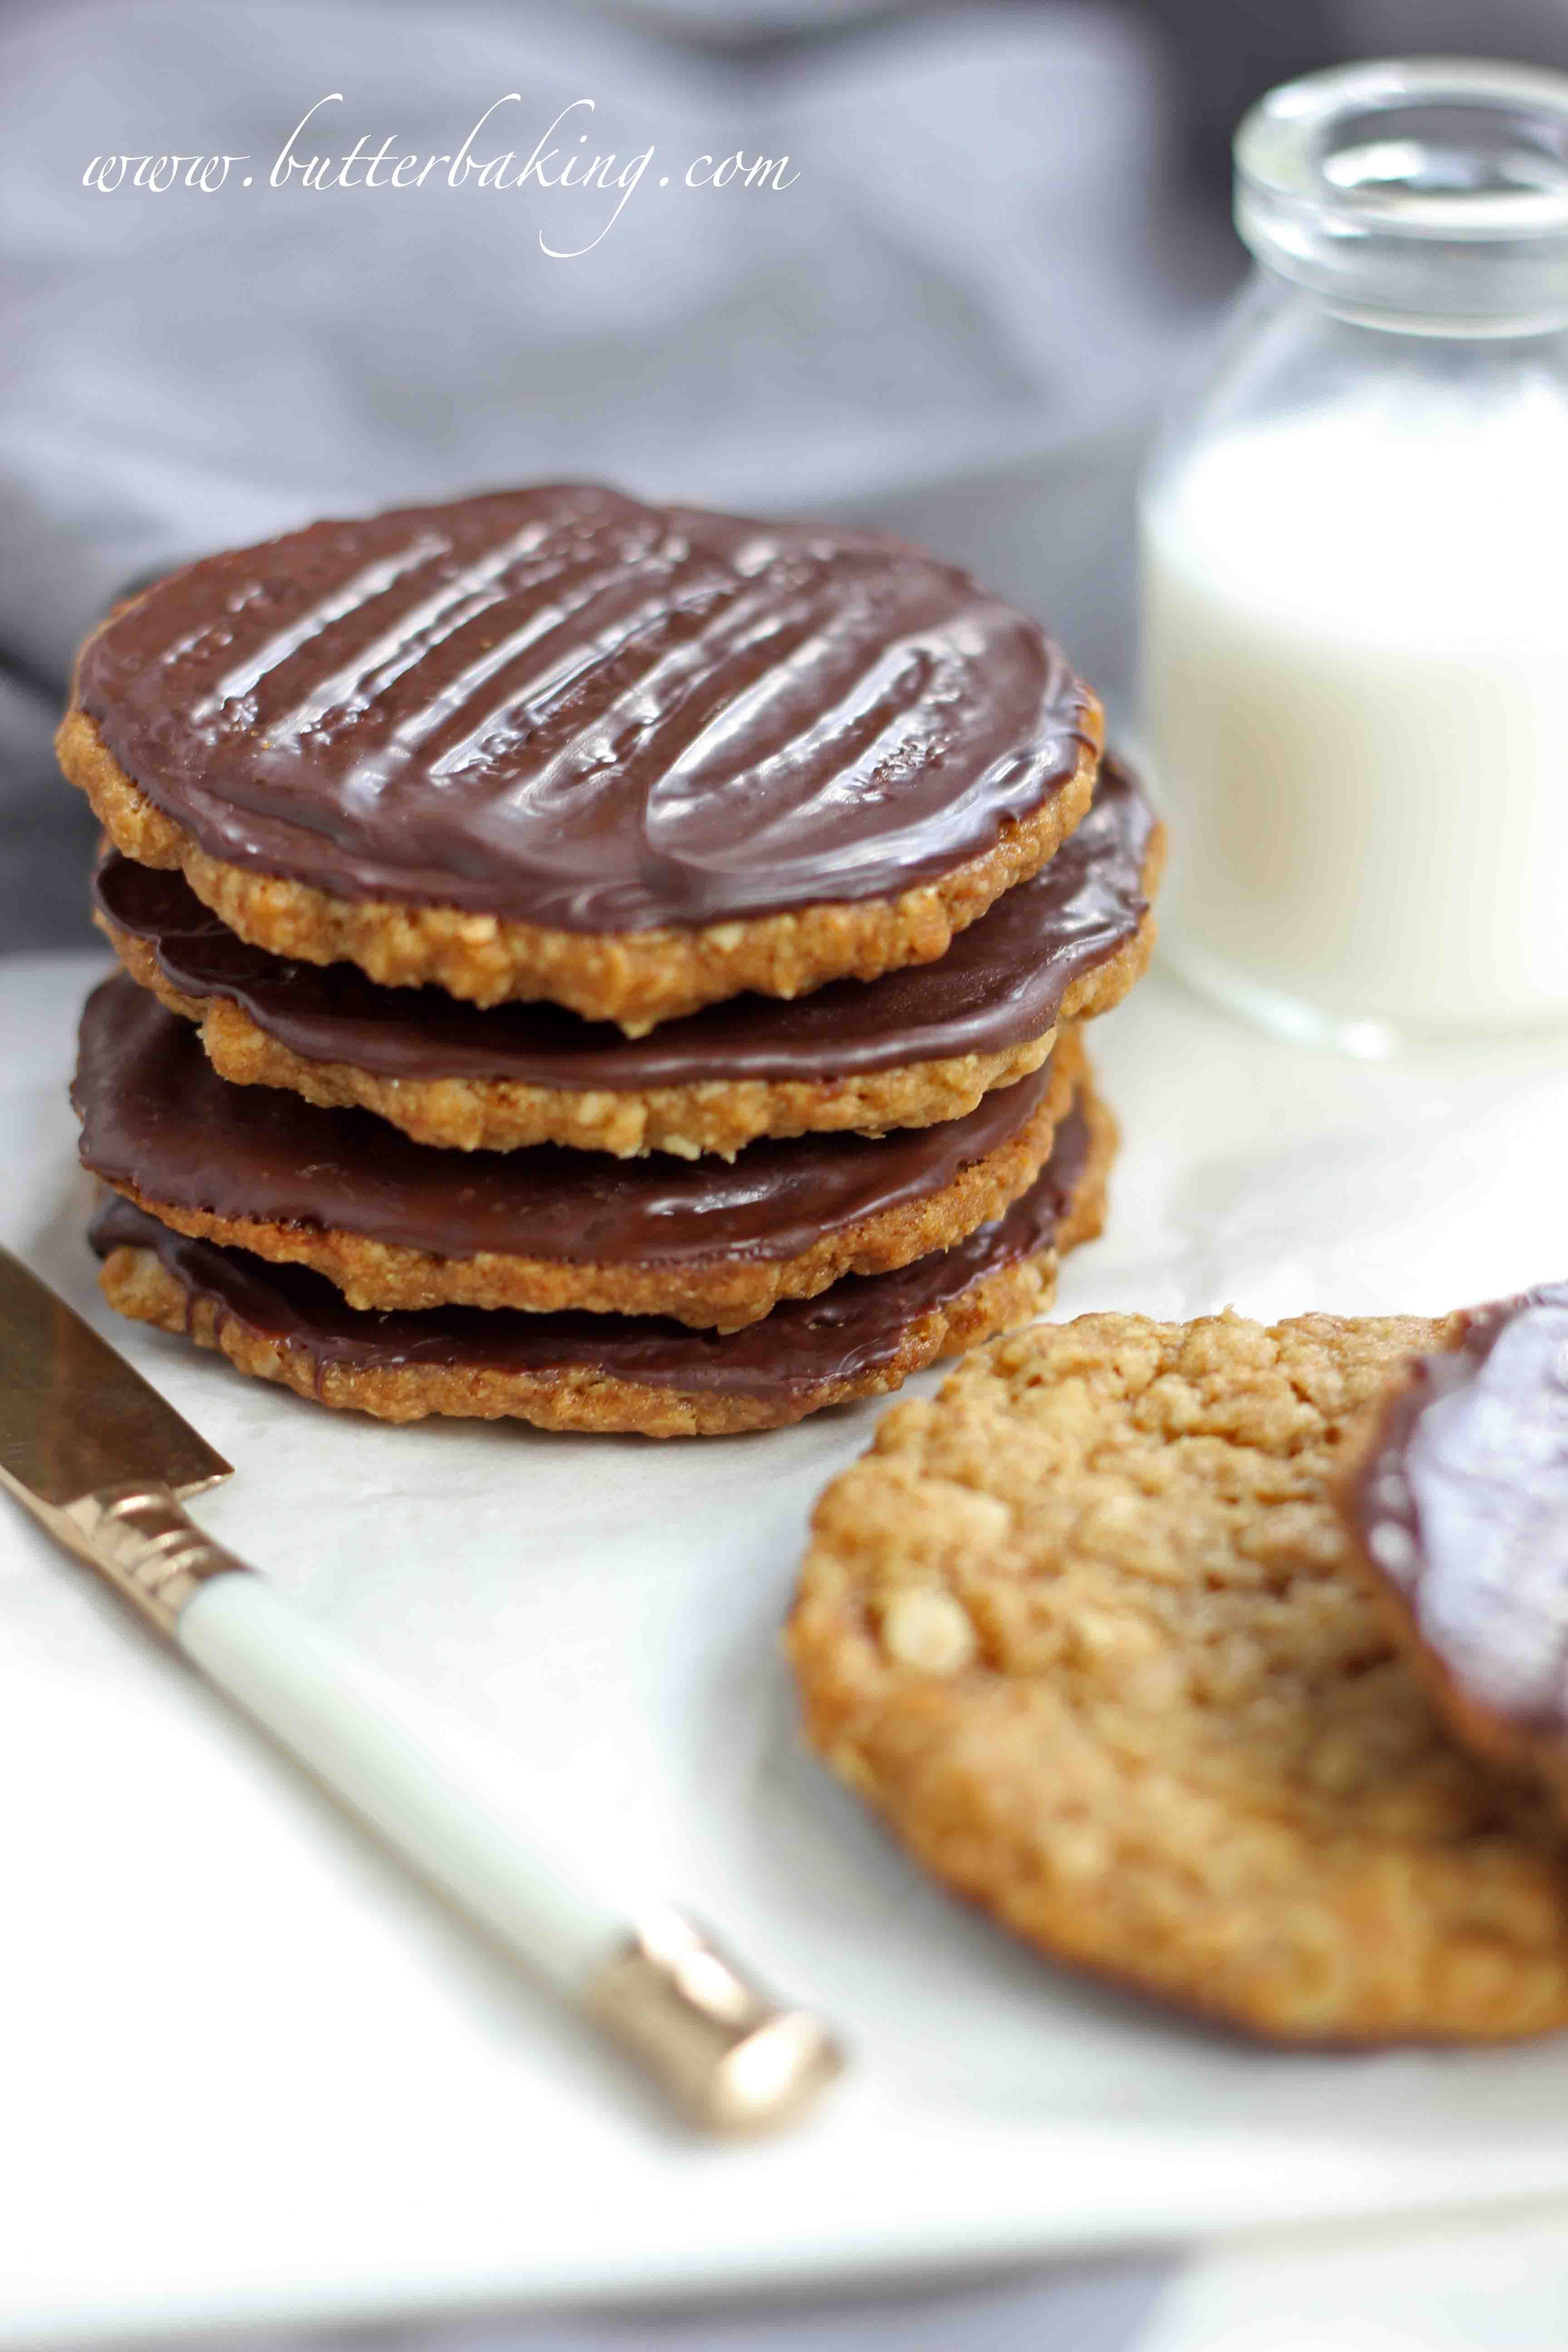 Chocolate hobnobs oat cookies Recipe